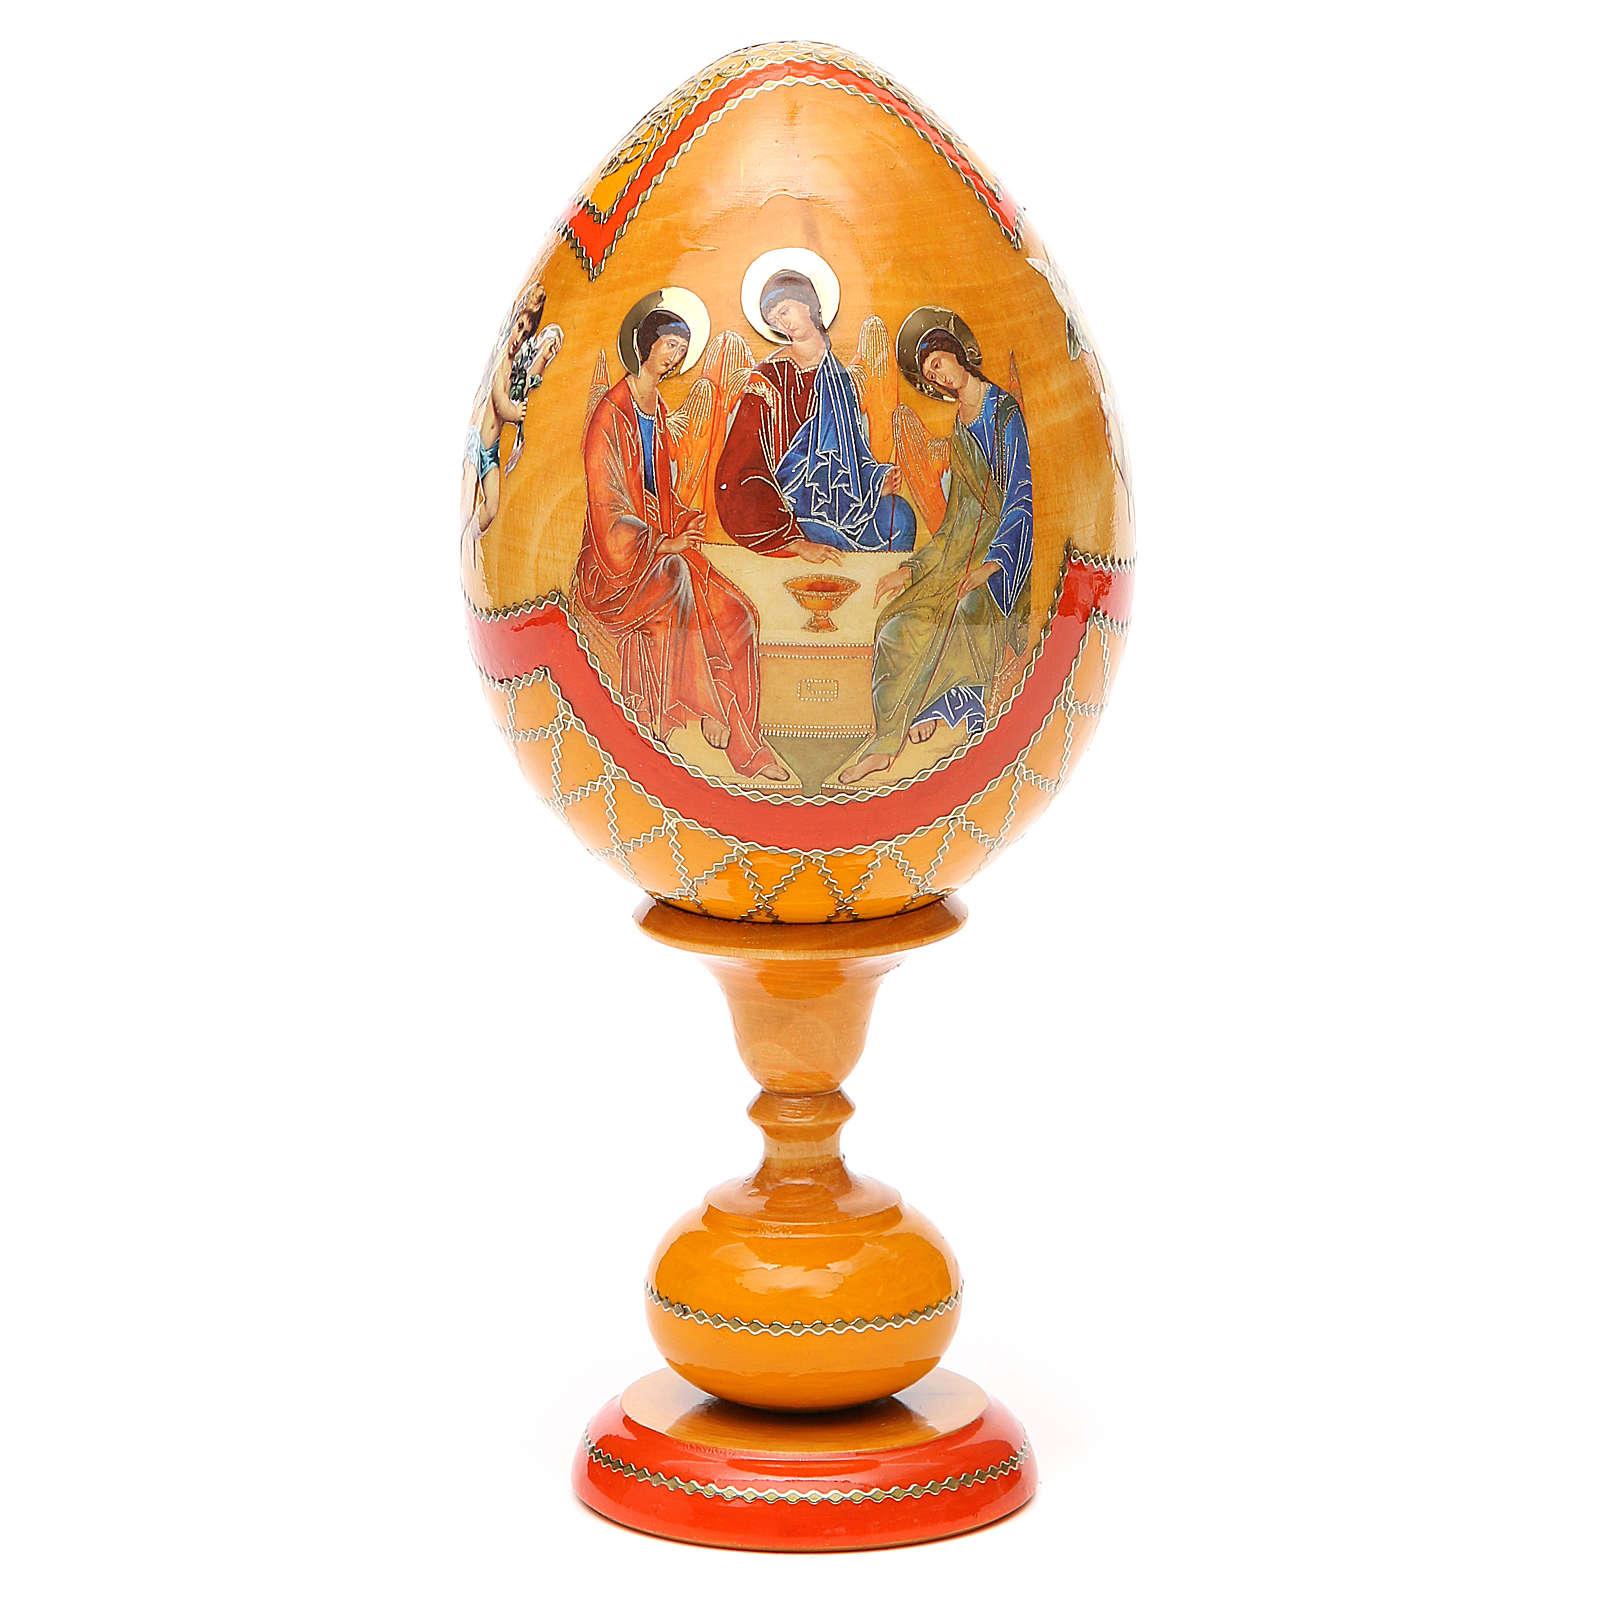 Russian Egg Rublev Trinity découpage, Fabergè style 20cm 4